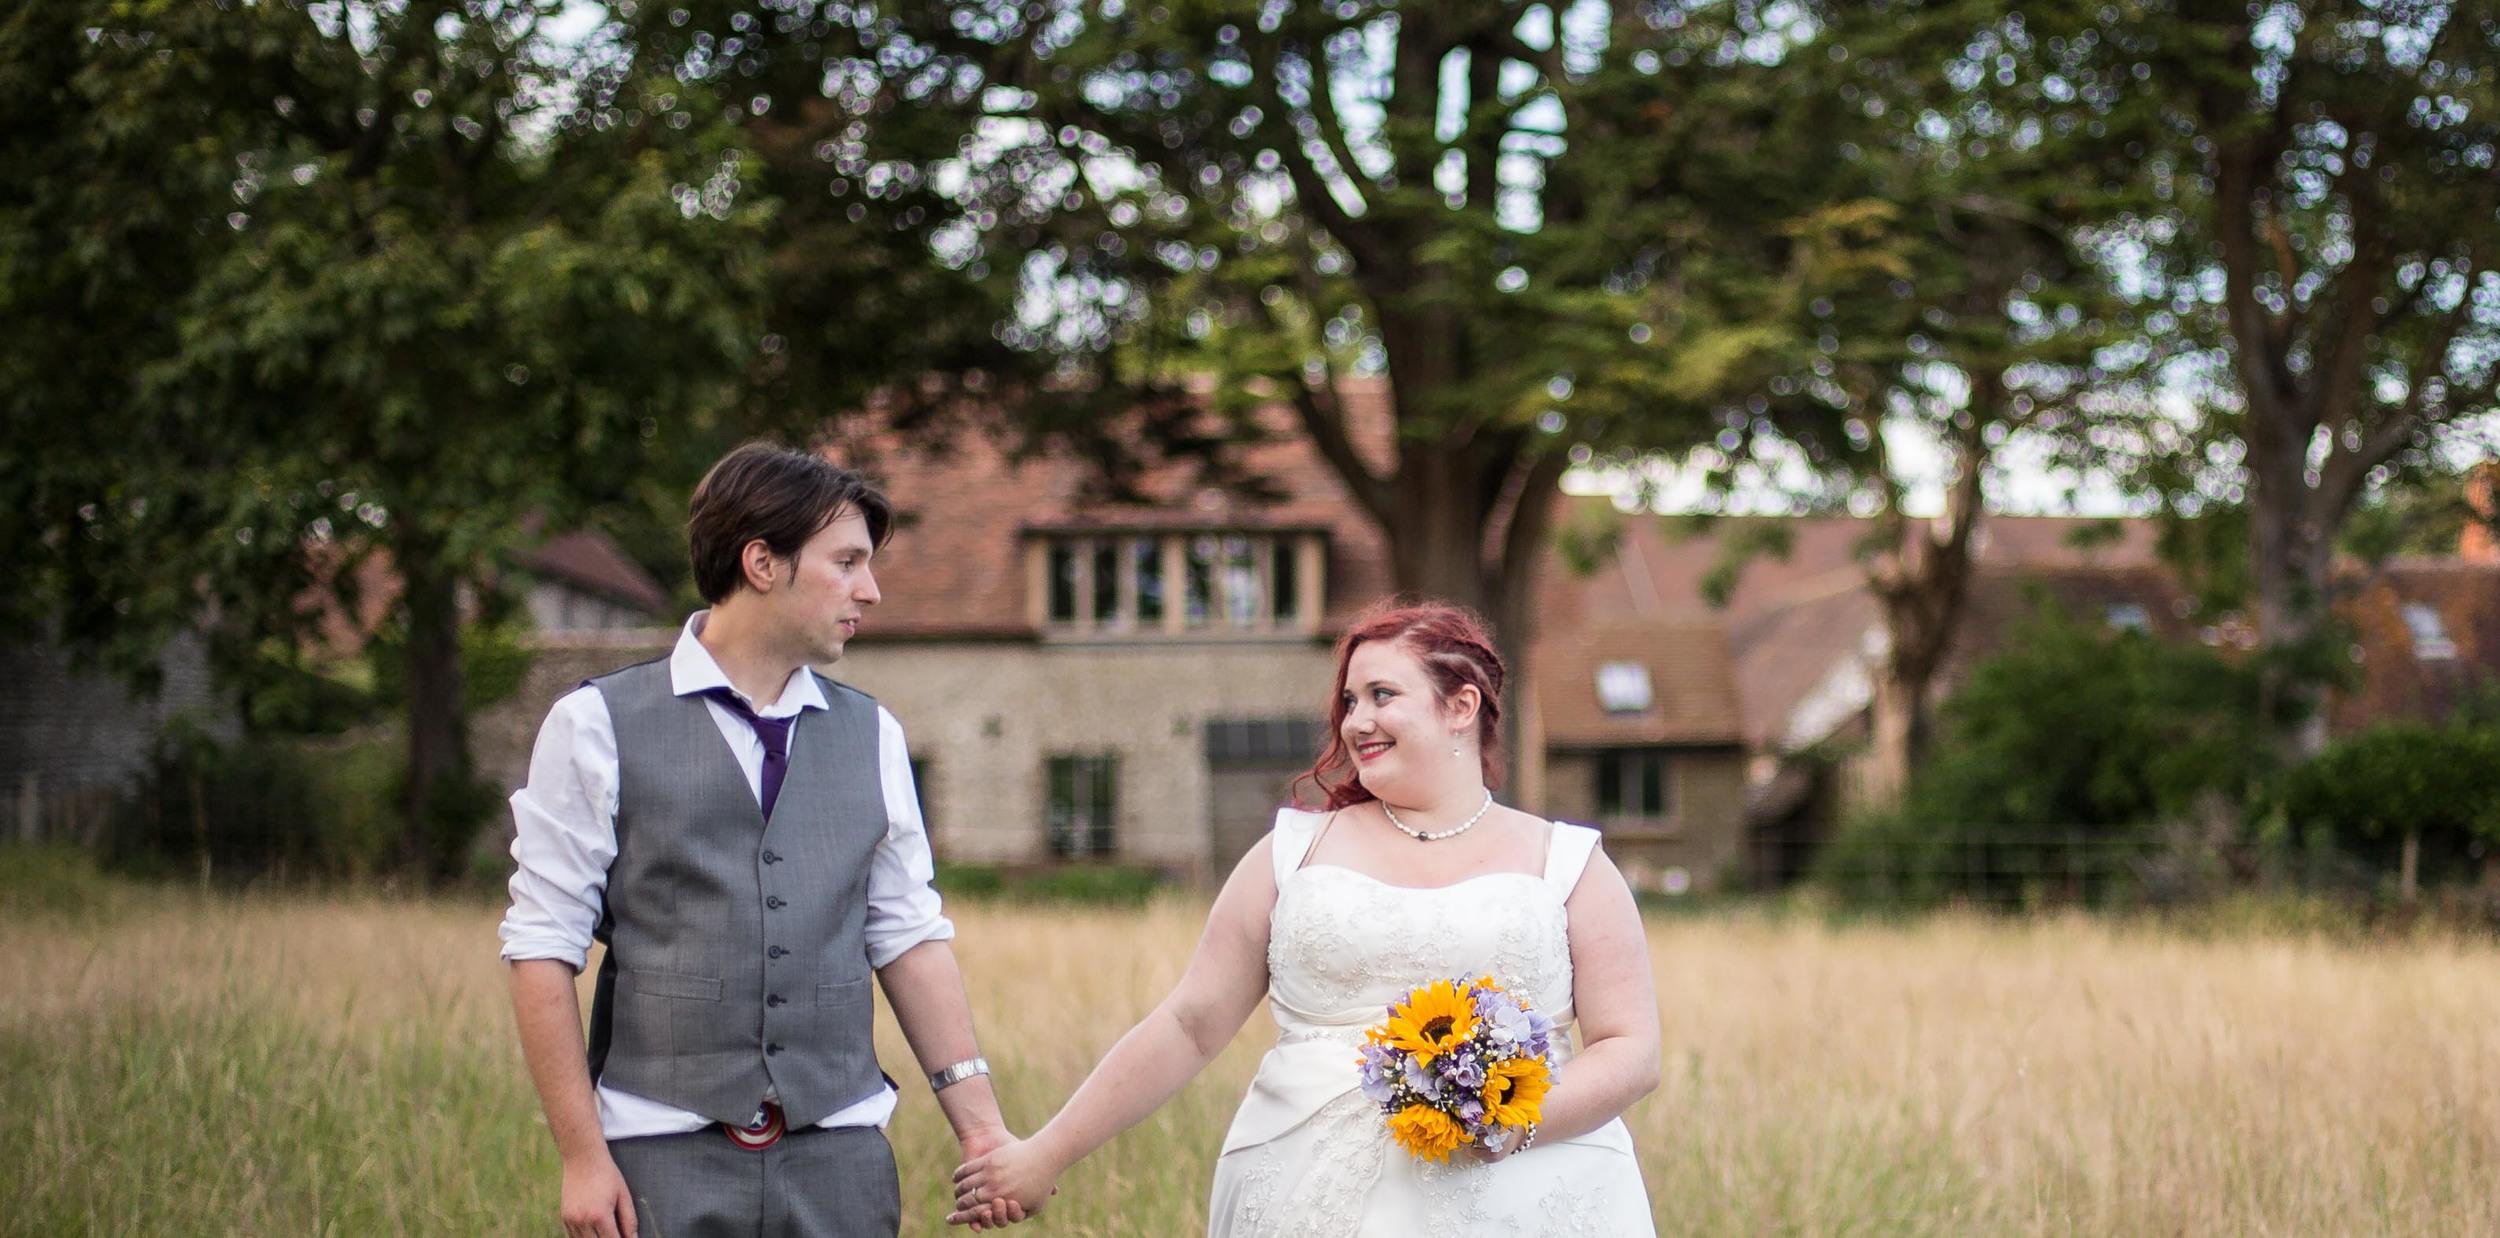 eastdean-village-hall-eastbourne-vintage-wedding-romance